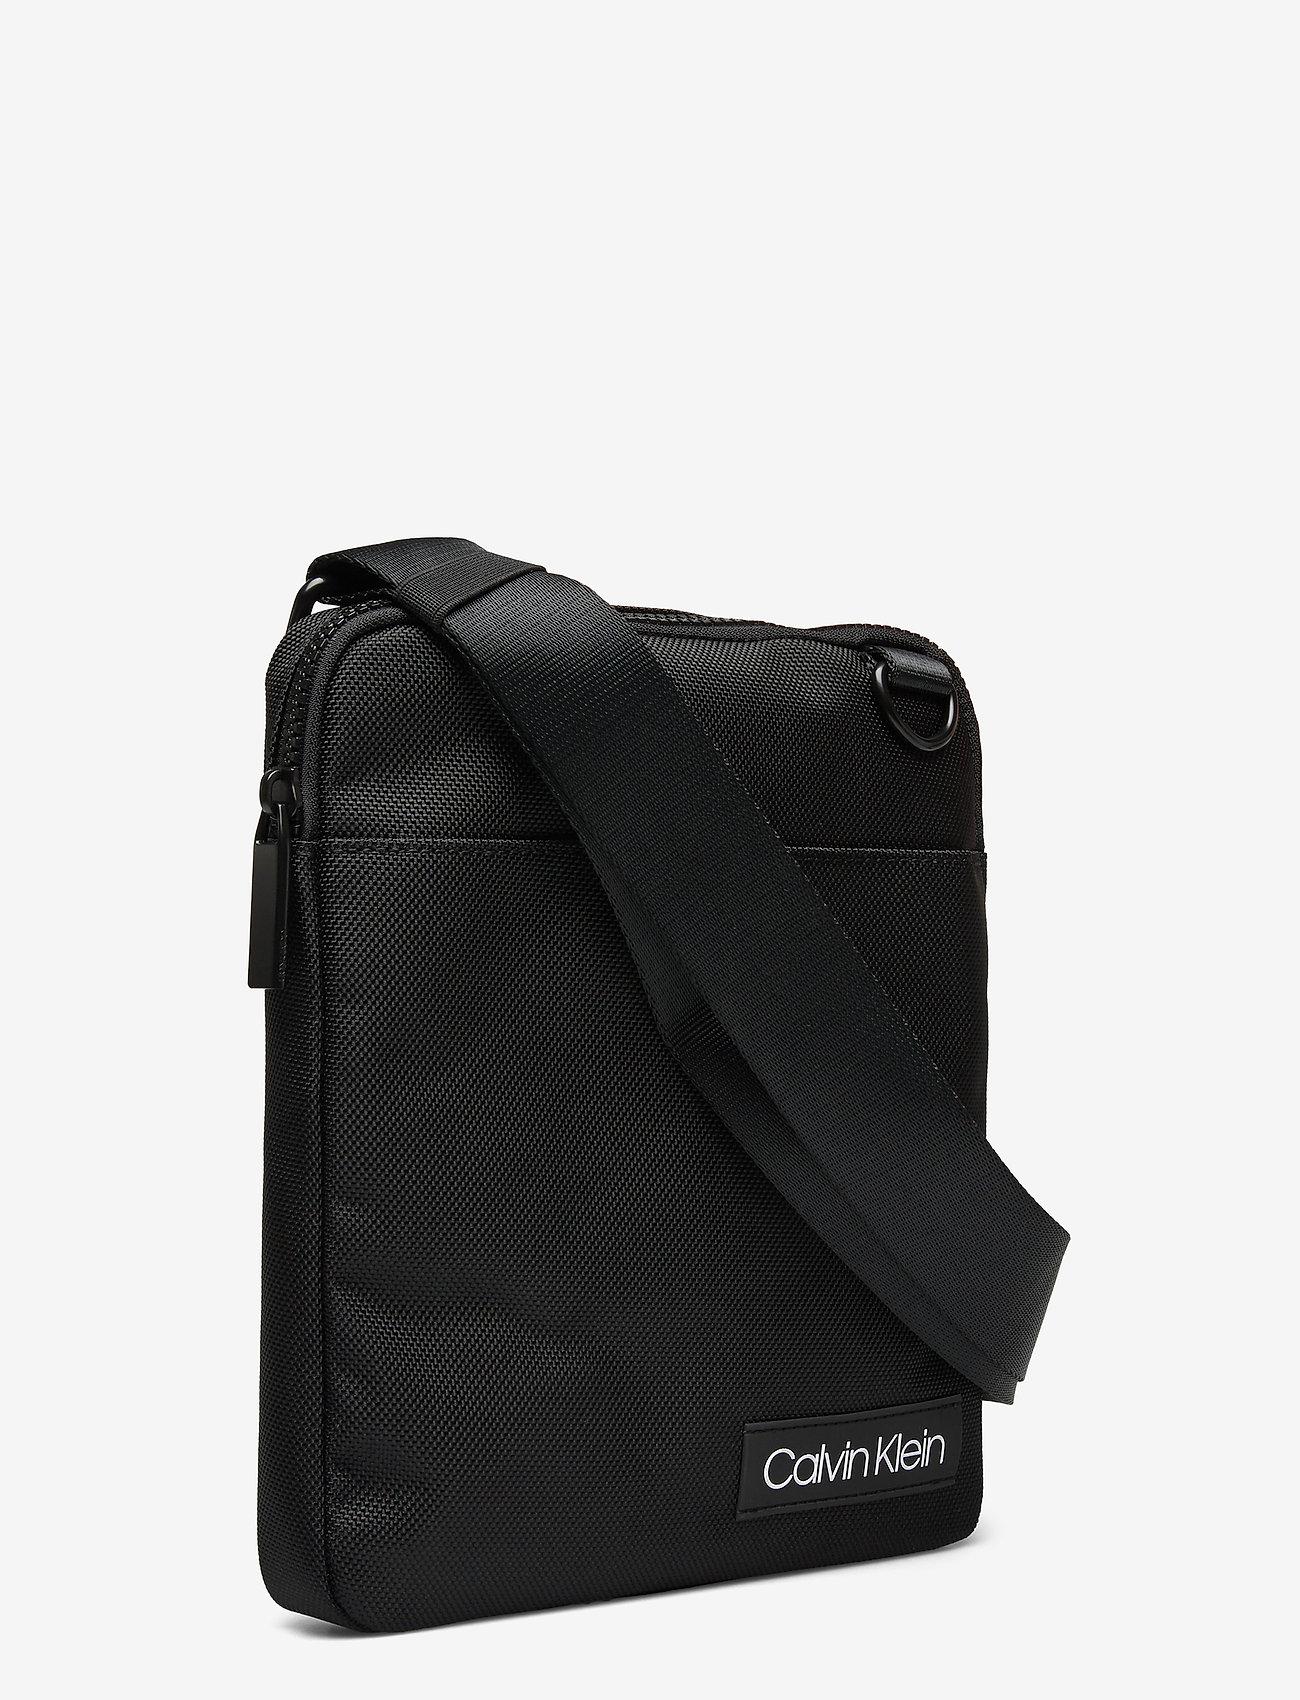 Calvin Klein - ULTIMATE NYLON FLAT - sacs à bandoulière - black - 2